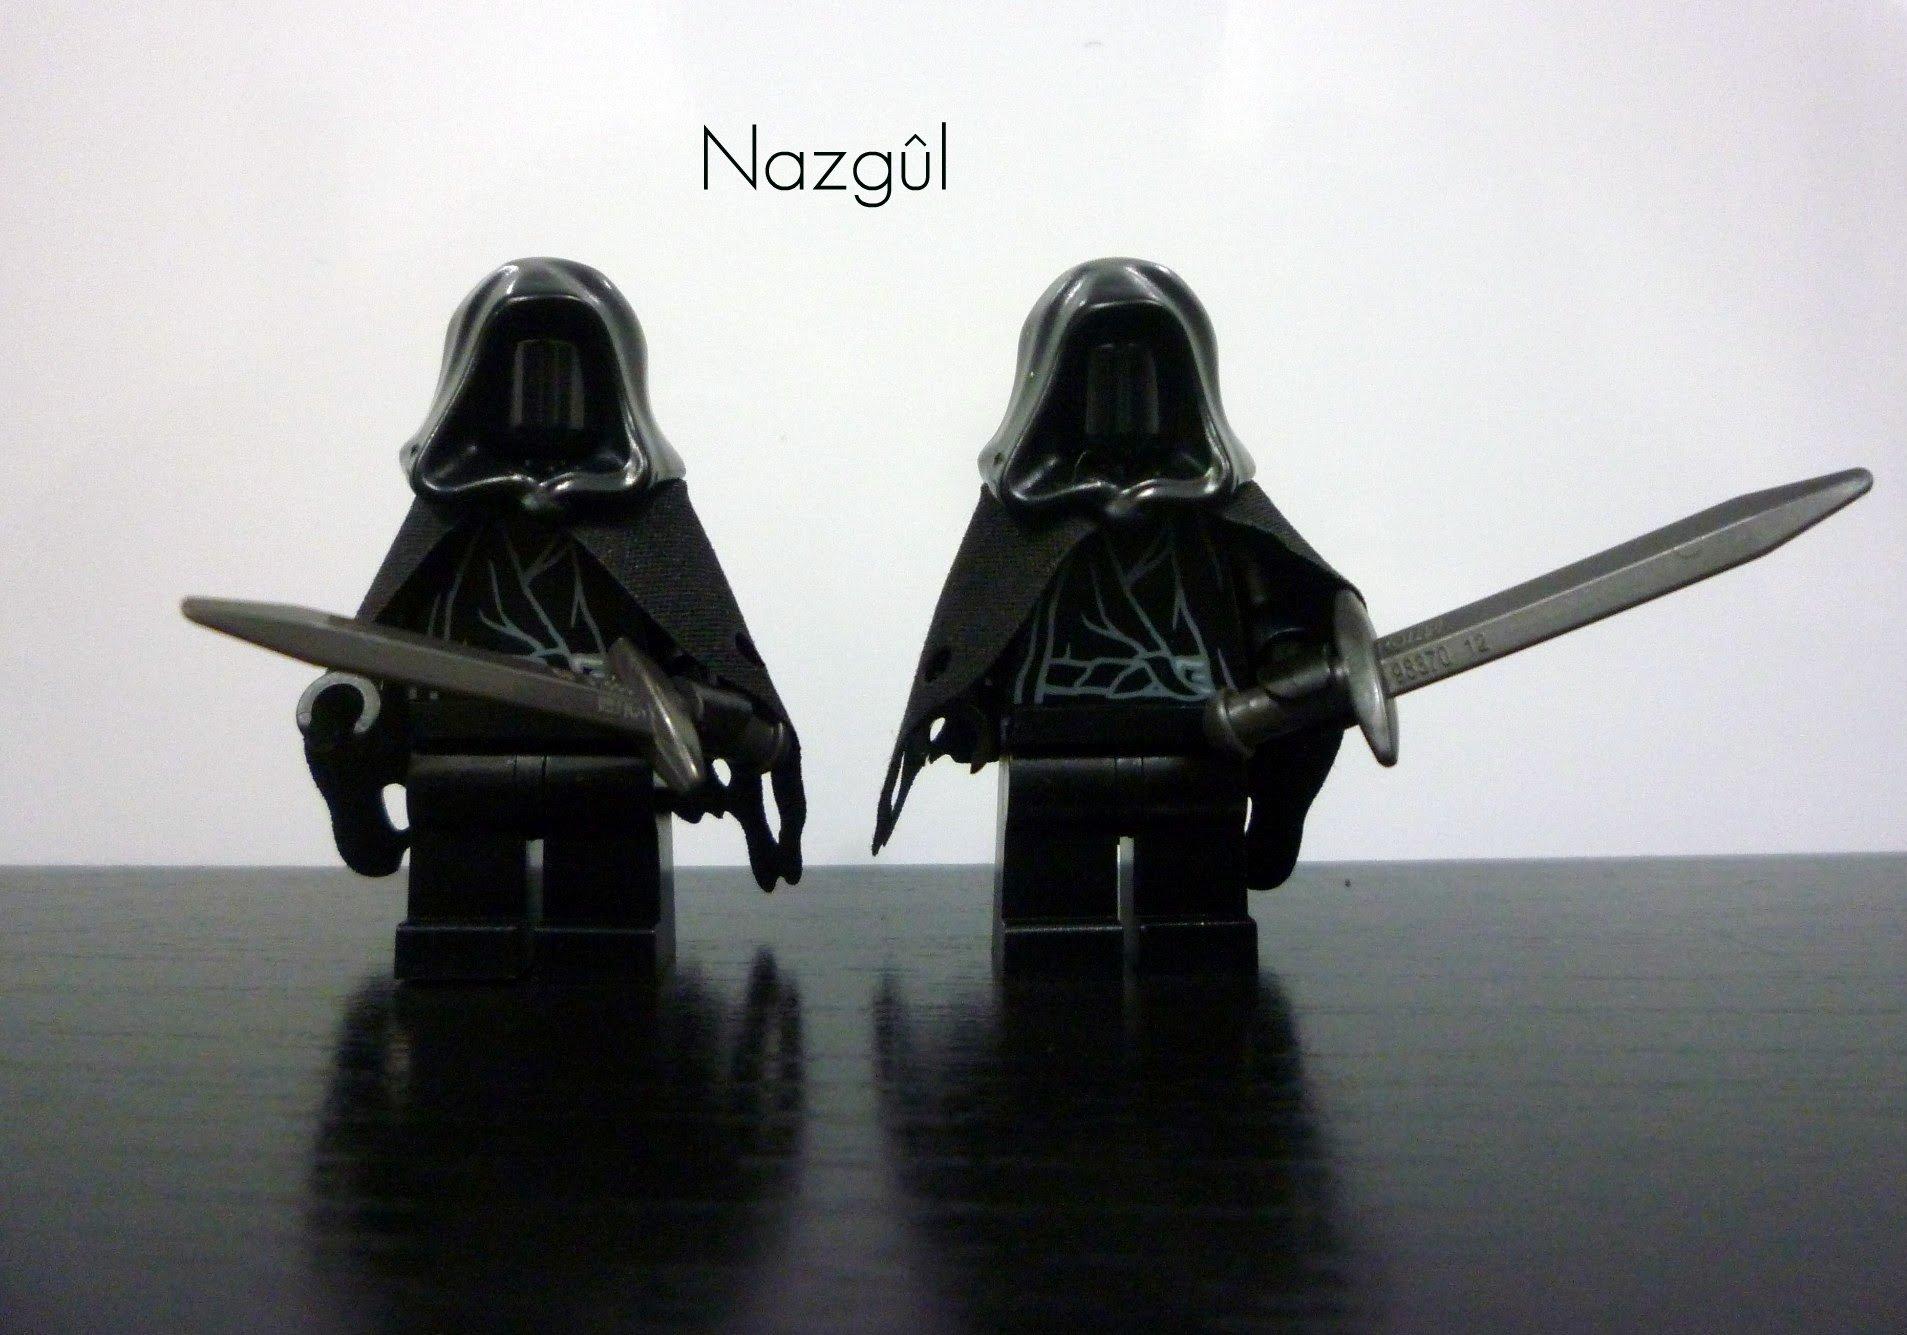 Lego Lord Rings Hobbit Lot 2 Minifigures Ringwraith Nazgul w// Black Horse 9472!